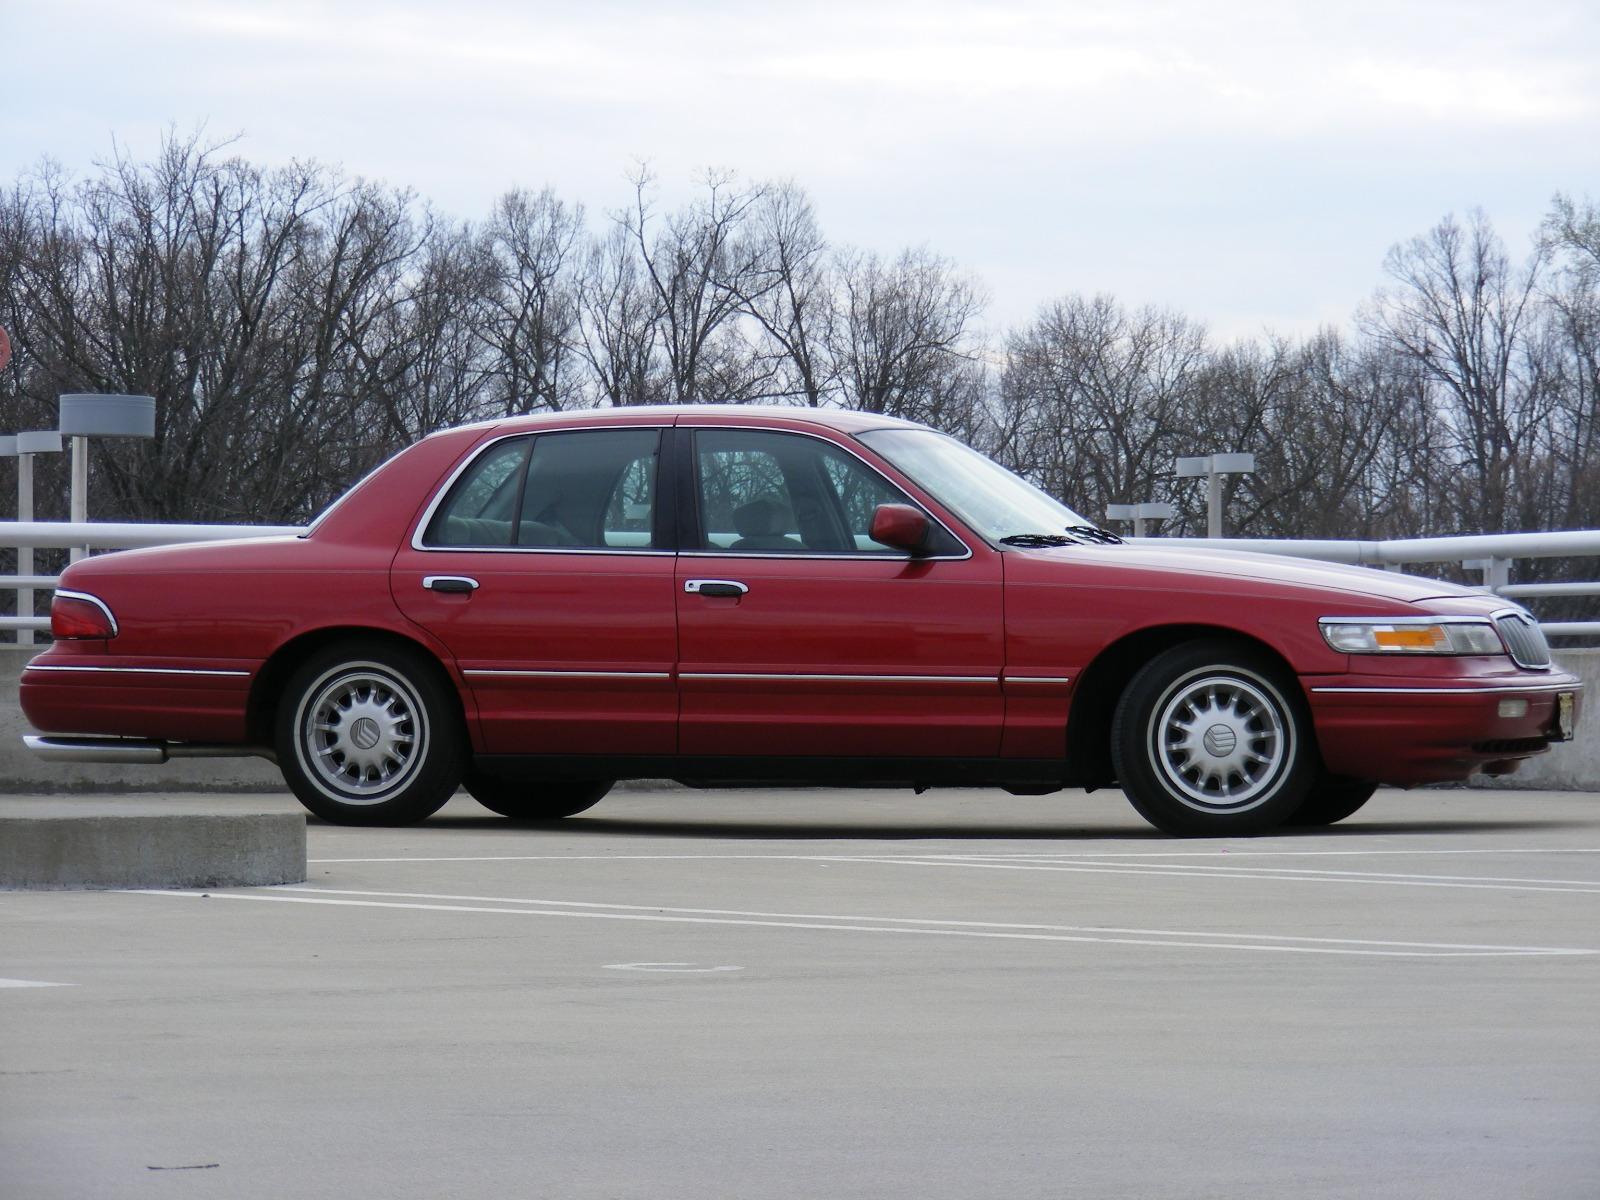 picture of 1997 mercury grand marquis 4 dr ls sedan exterior. Black Bedroom Furniture Sets. Home Design Ideas